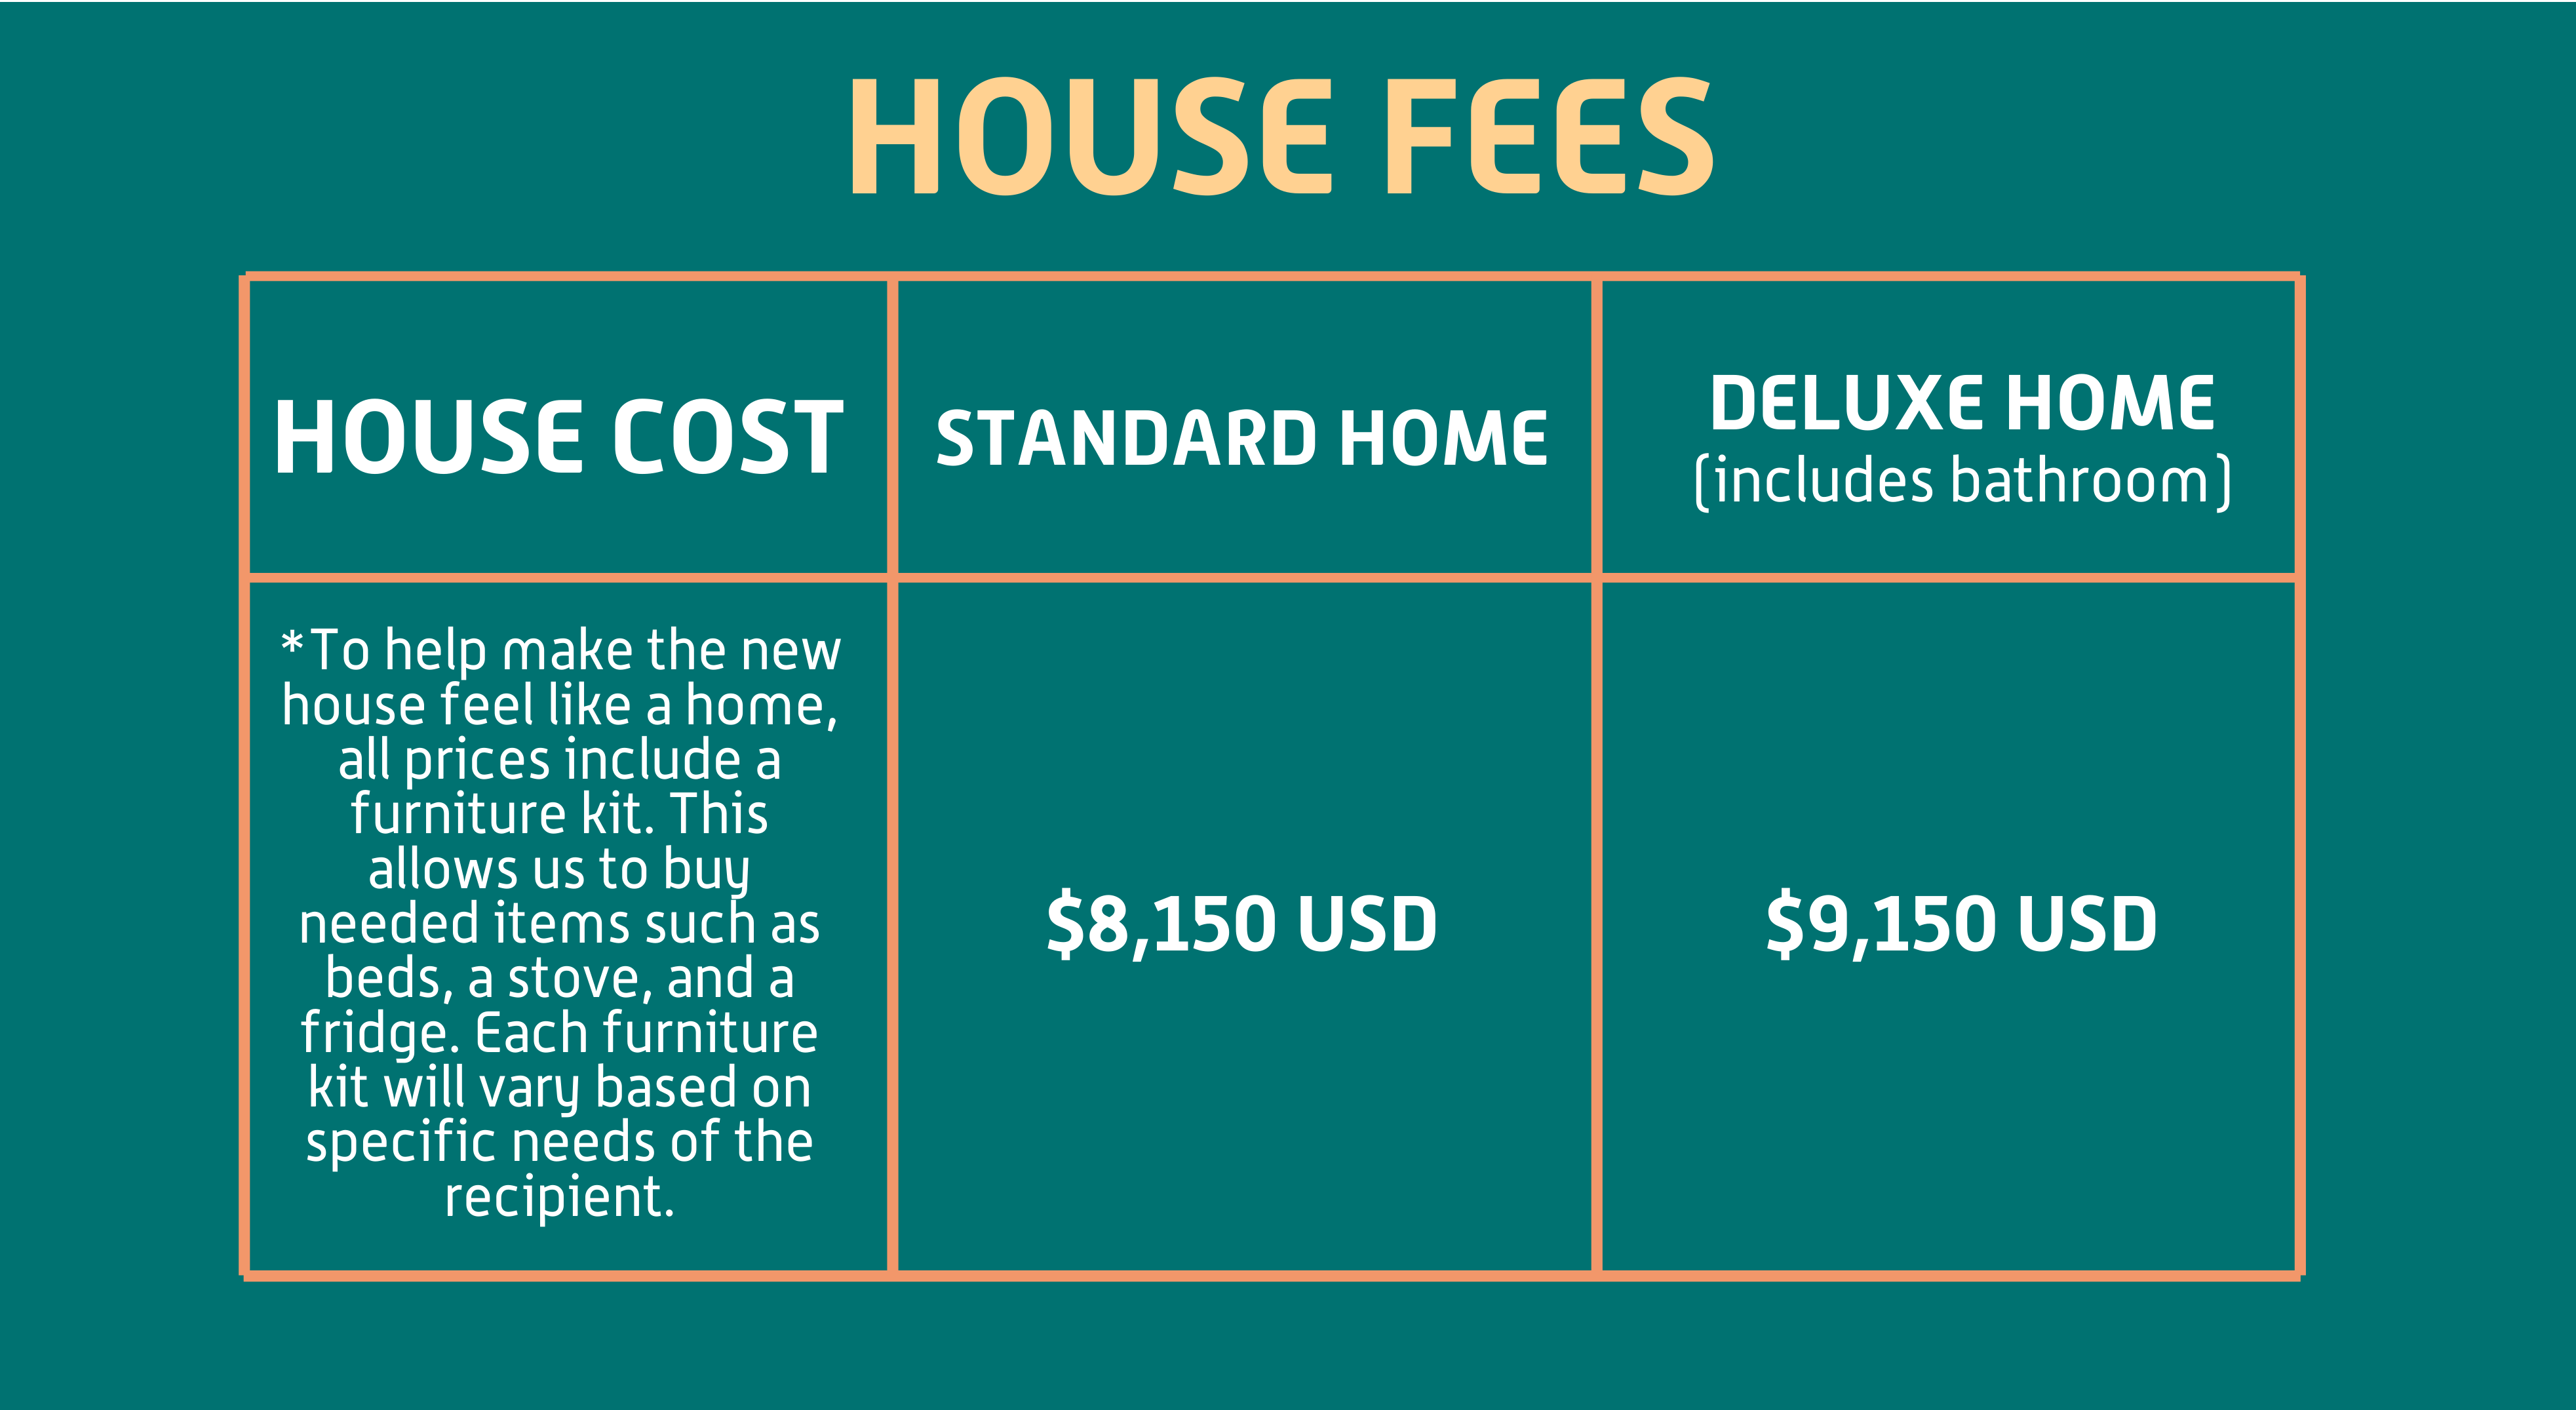 HOUSE FEES